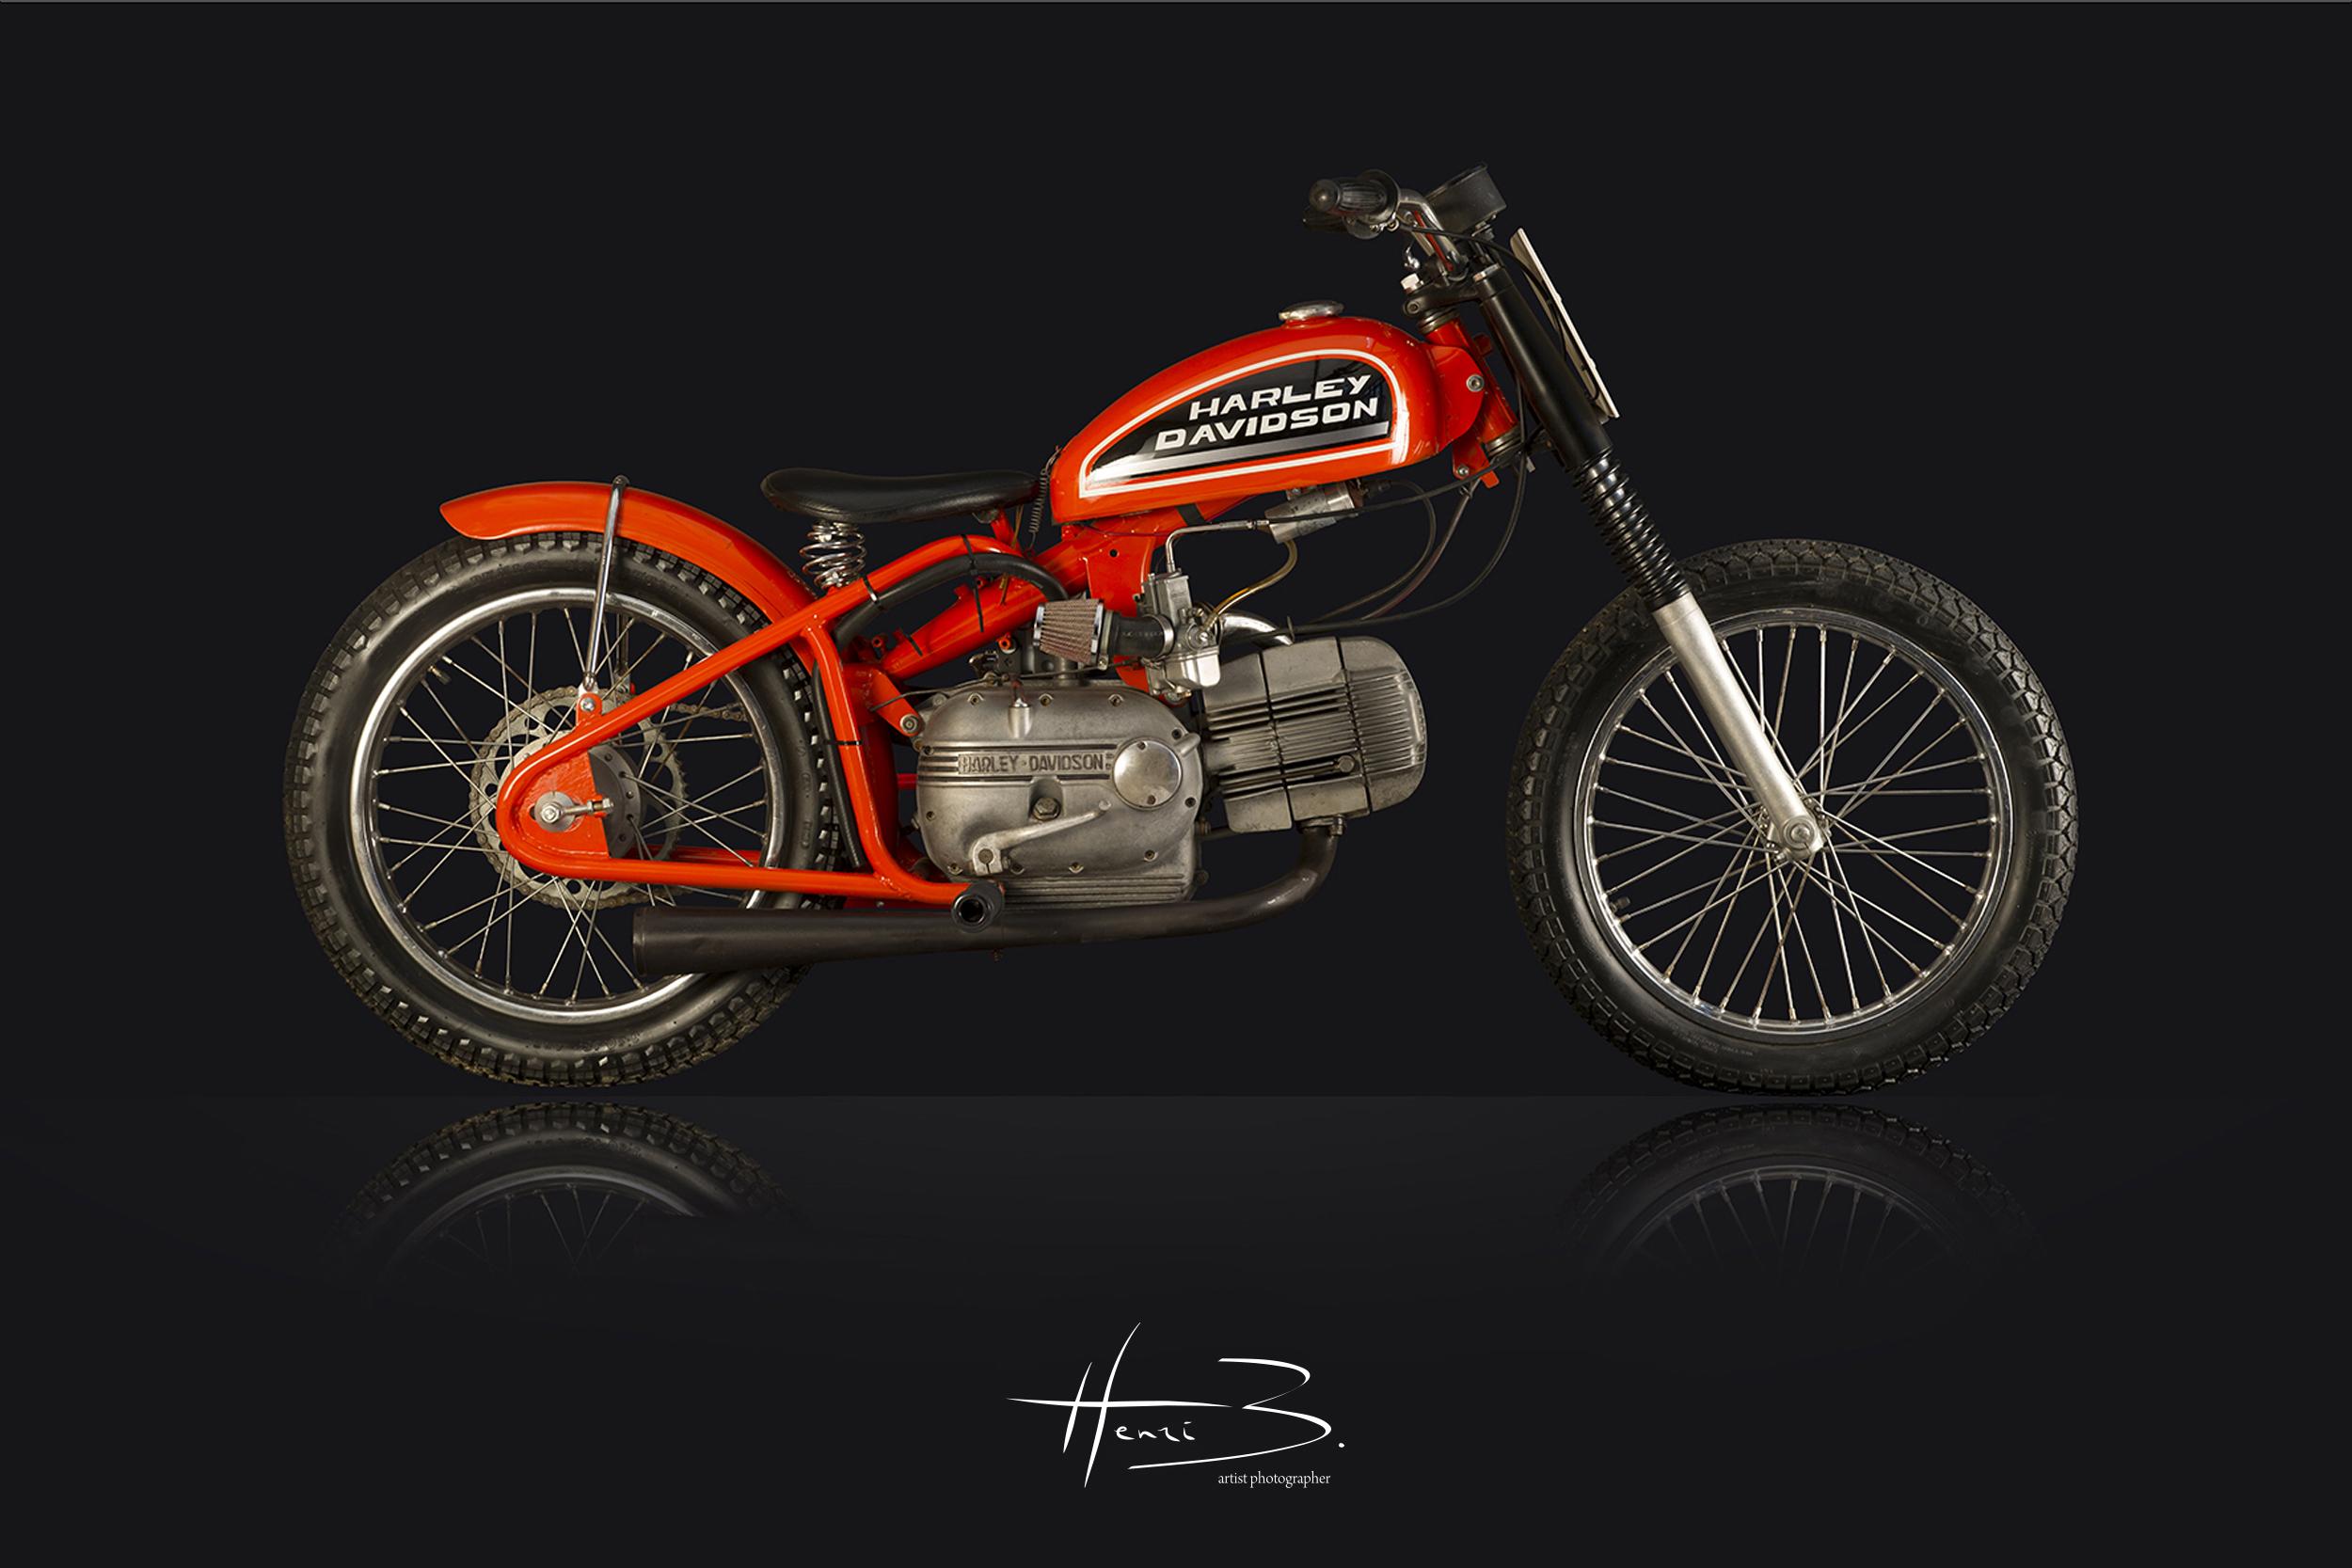 Harley Davidson 250 CR